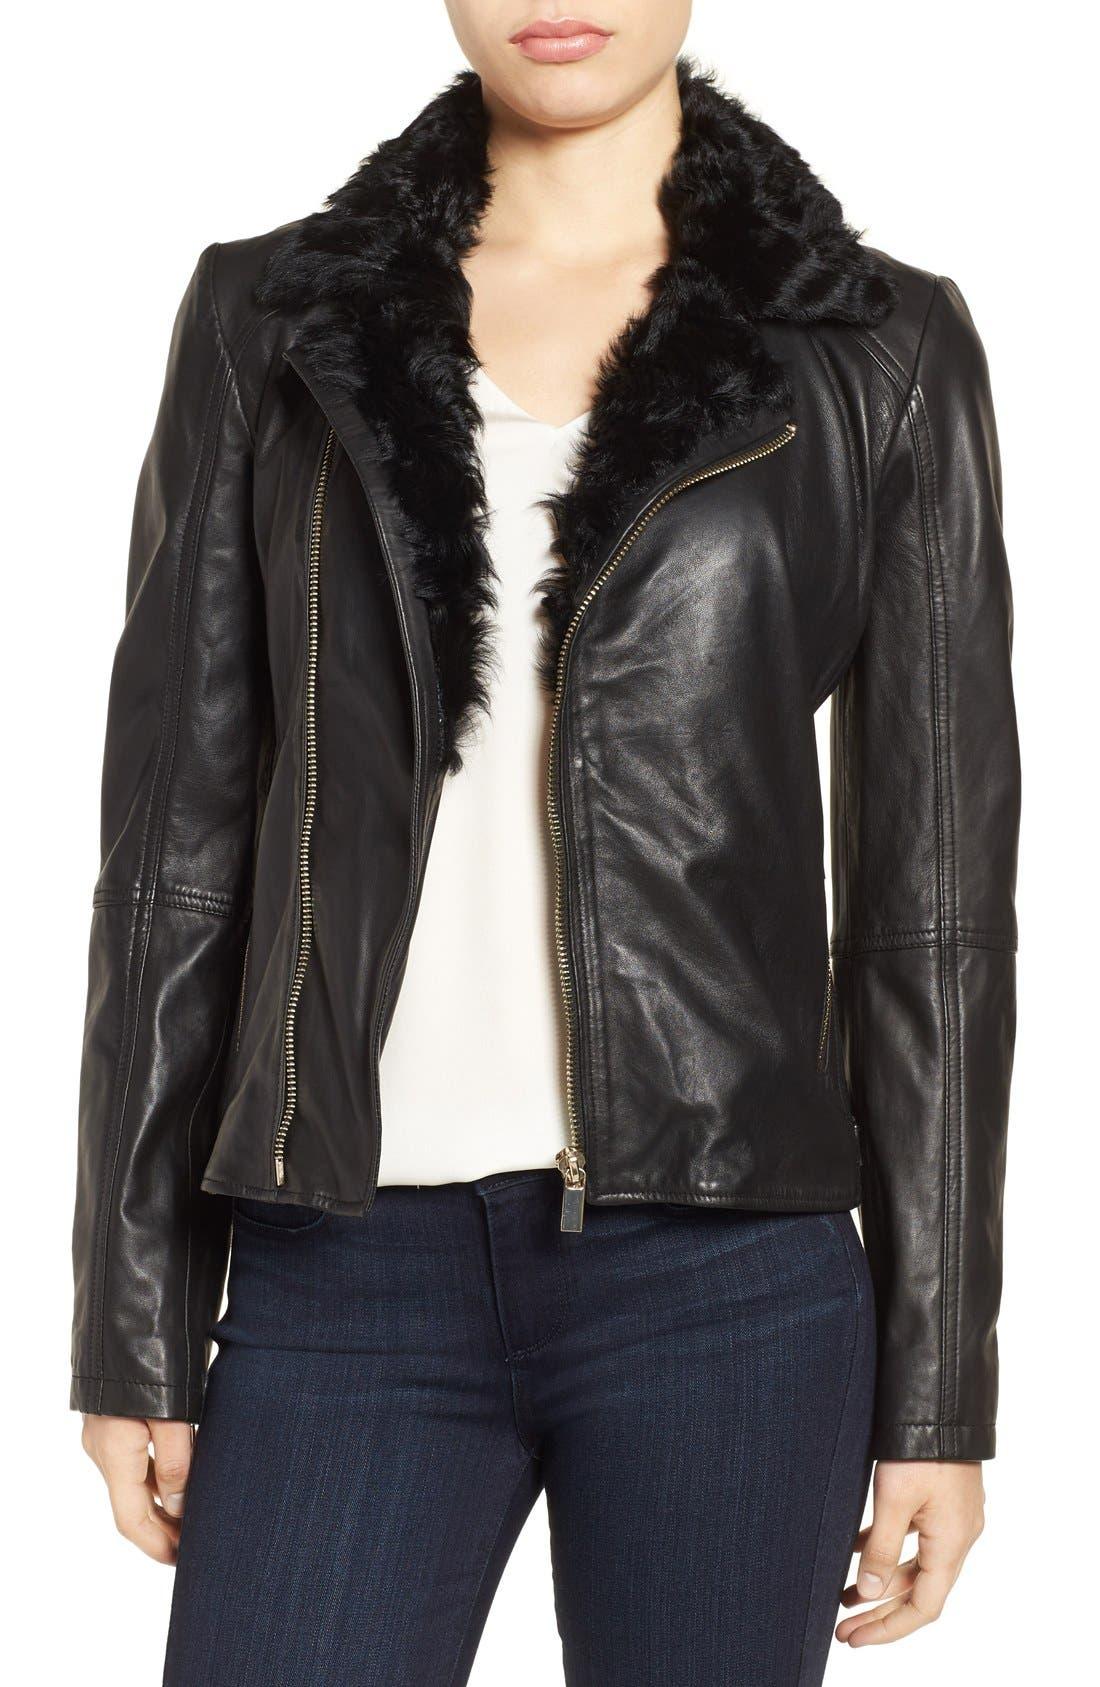 Main Image - Badgley Mischka 'Irina' Leather Moto Jacket with Genuine Shearling Collar